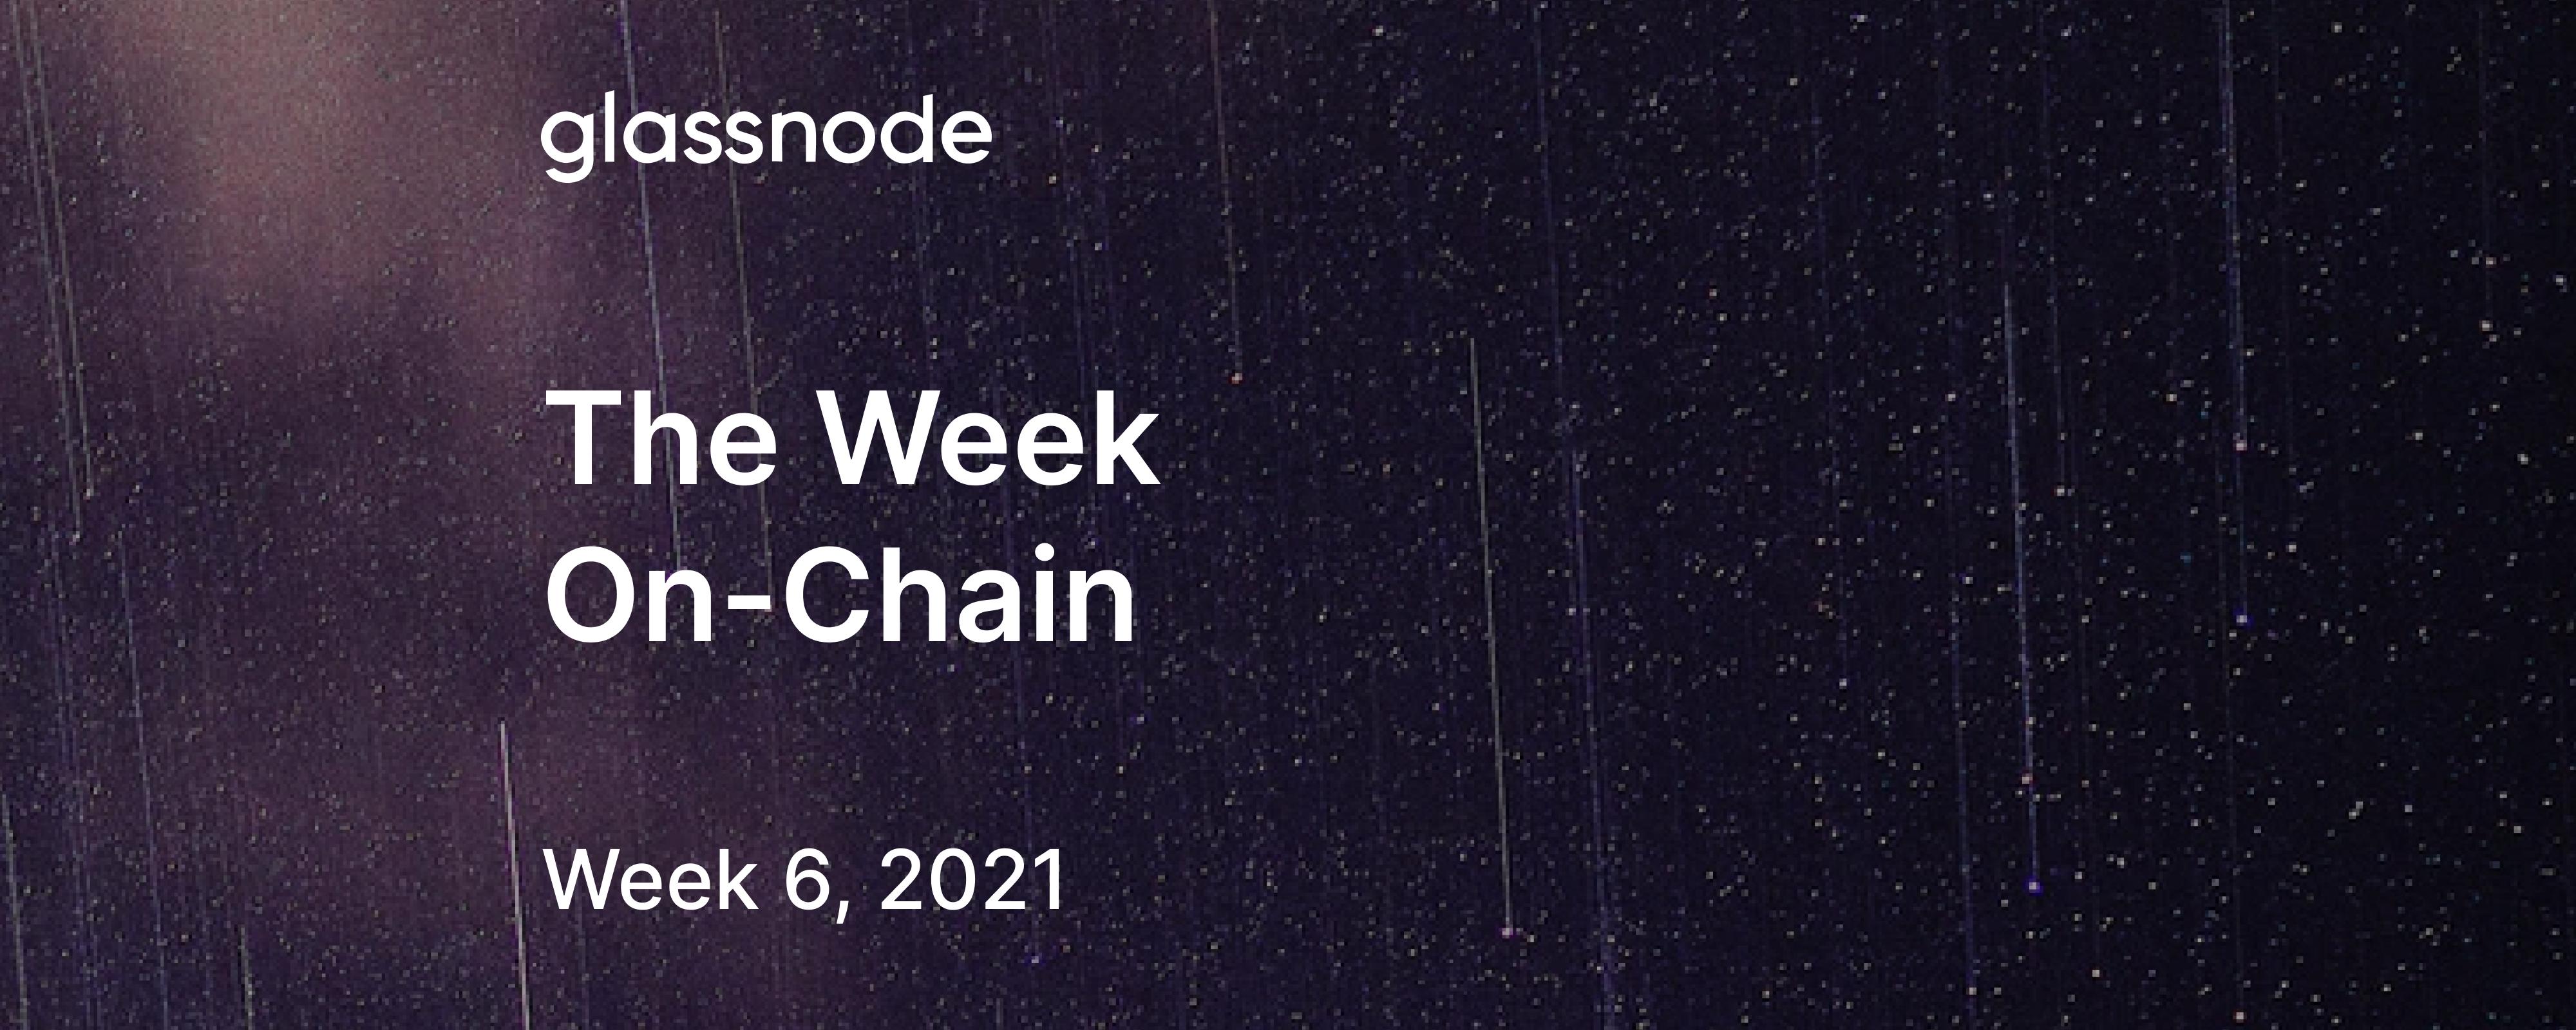 The Week On-Chain (Week 6, 2021)